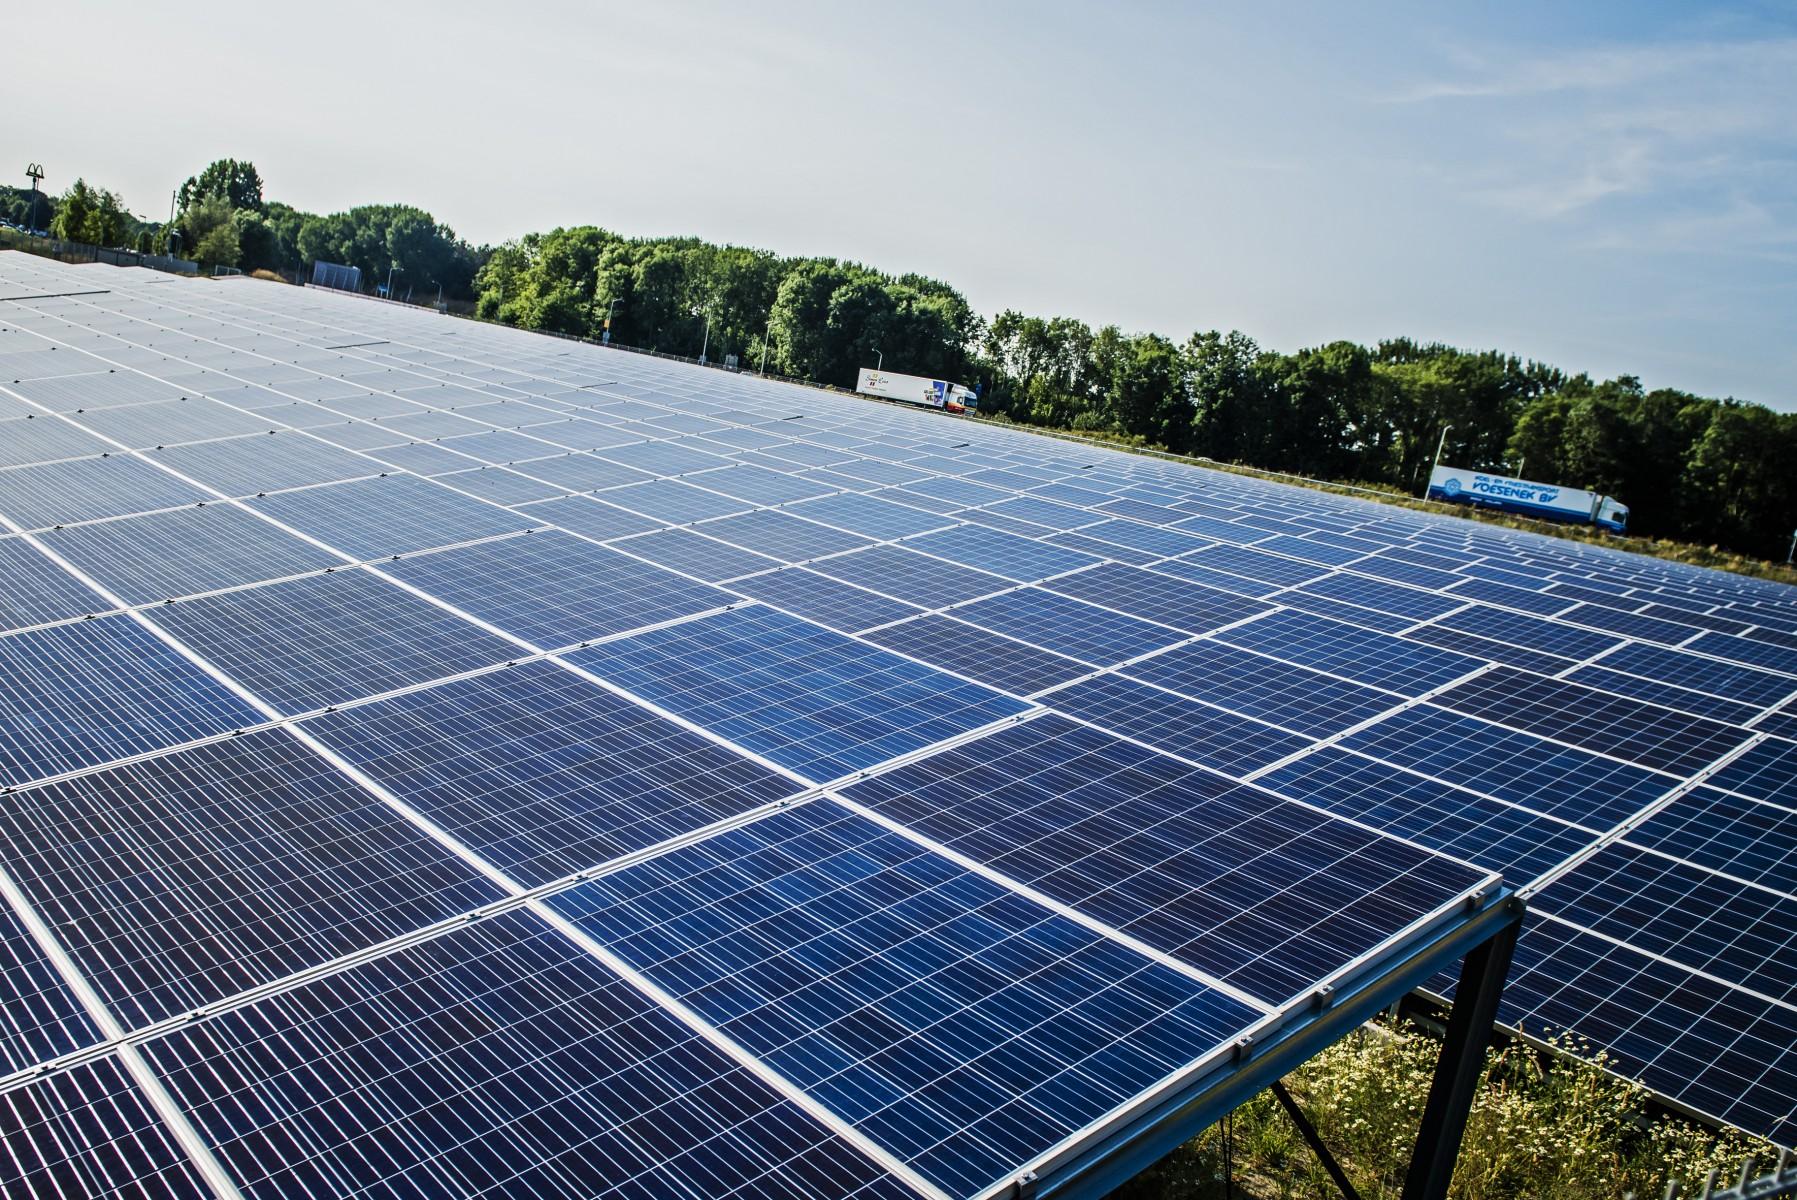 Achmea werkt in 2030 volledig klimaatneutraal